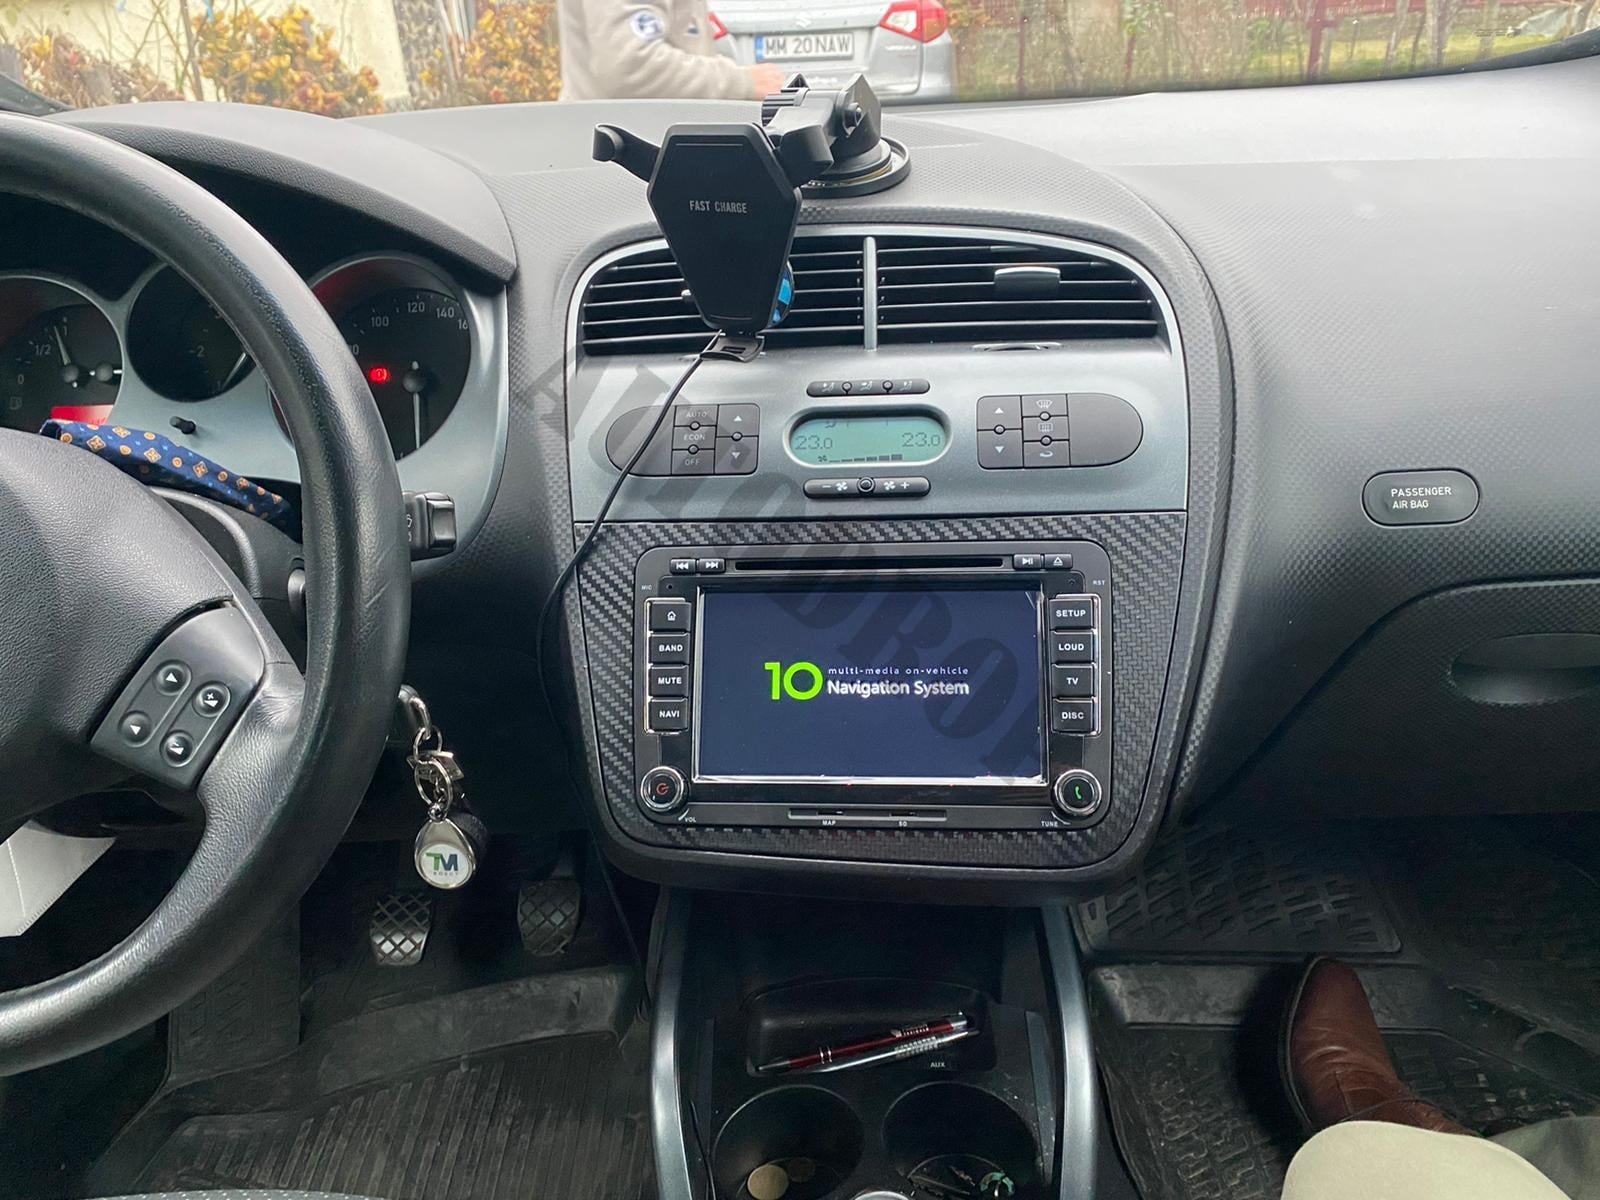 navigatie-auto-gps-multimedia-volkswagen-passat-b6-b7-golf-tiguan-carpad-android